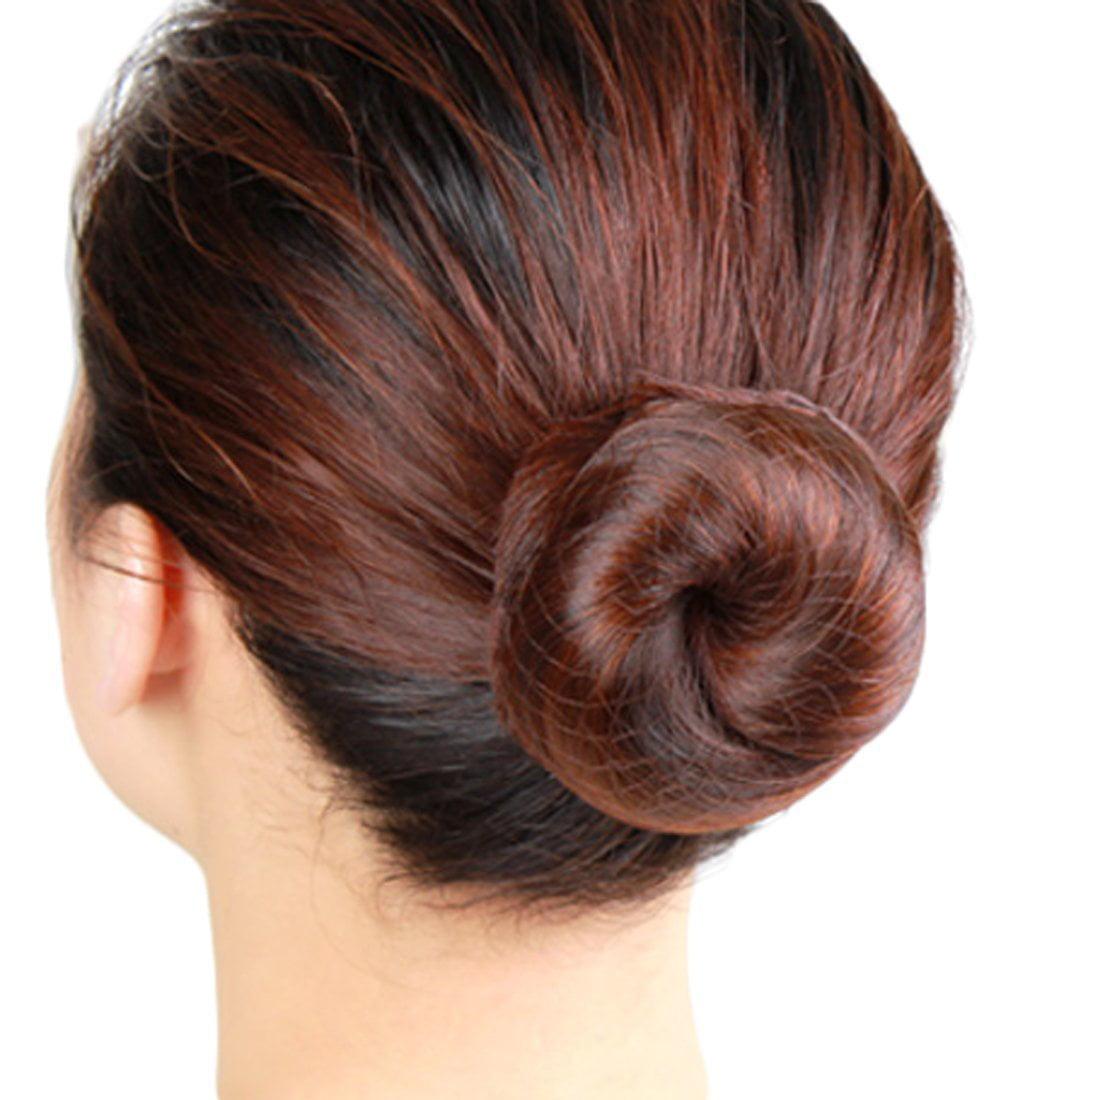 Bulk Packing,Brown 50pcs Hair Nets Invisible Elastic Edge Mesh 20 Inches 50cm